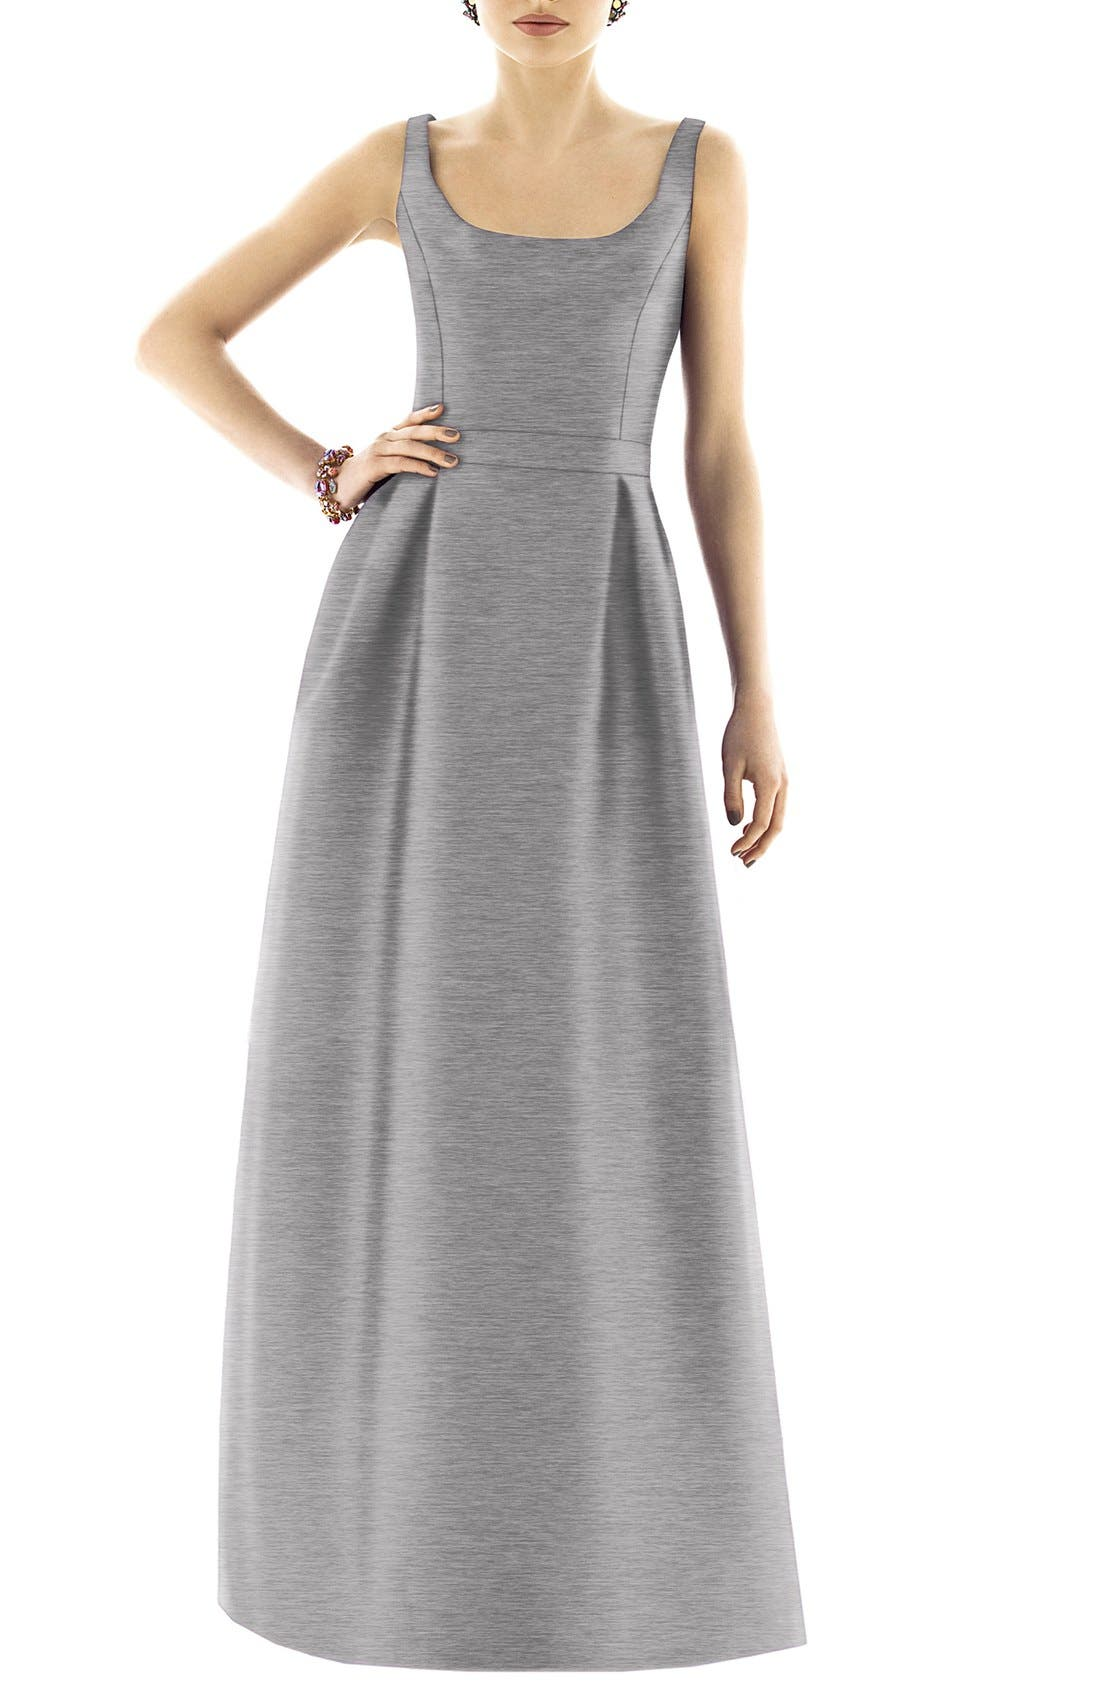 Scoop Neck Dupioni Full Length Dress,                             Alternate thumbnail 12, color,